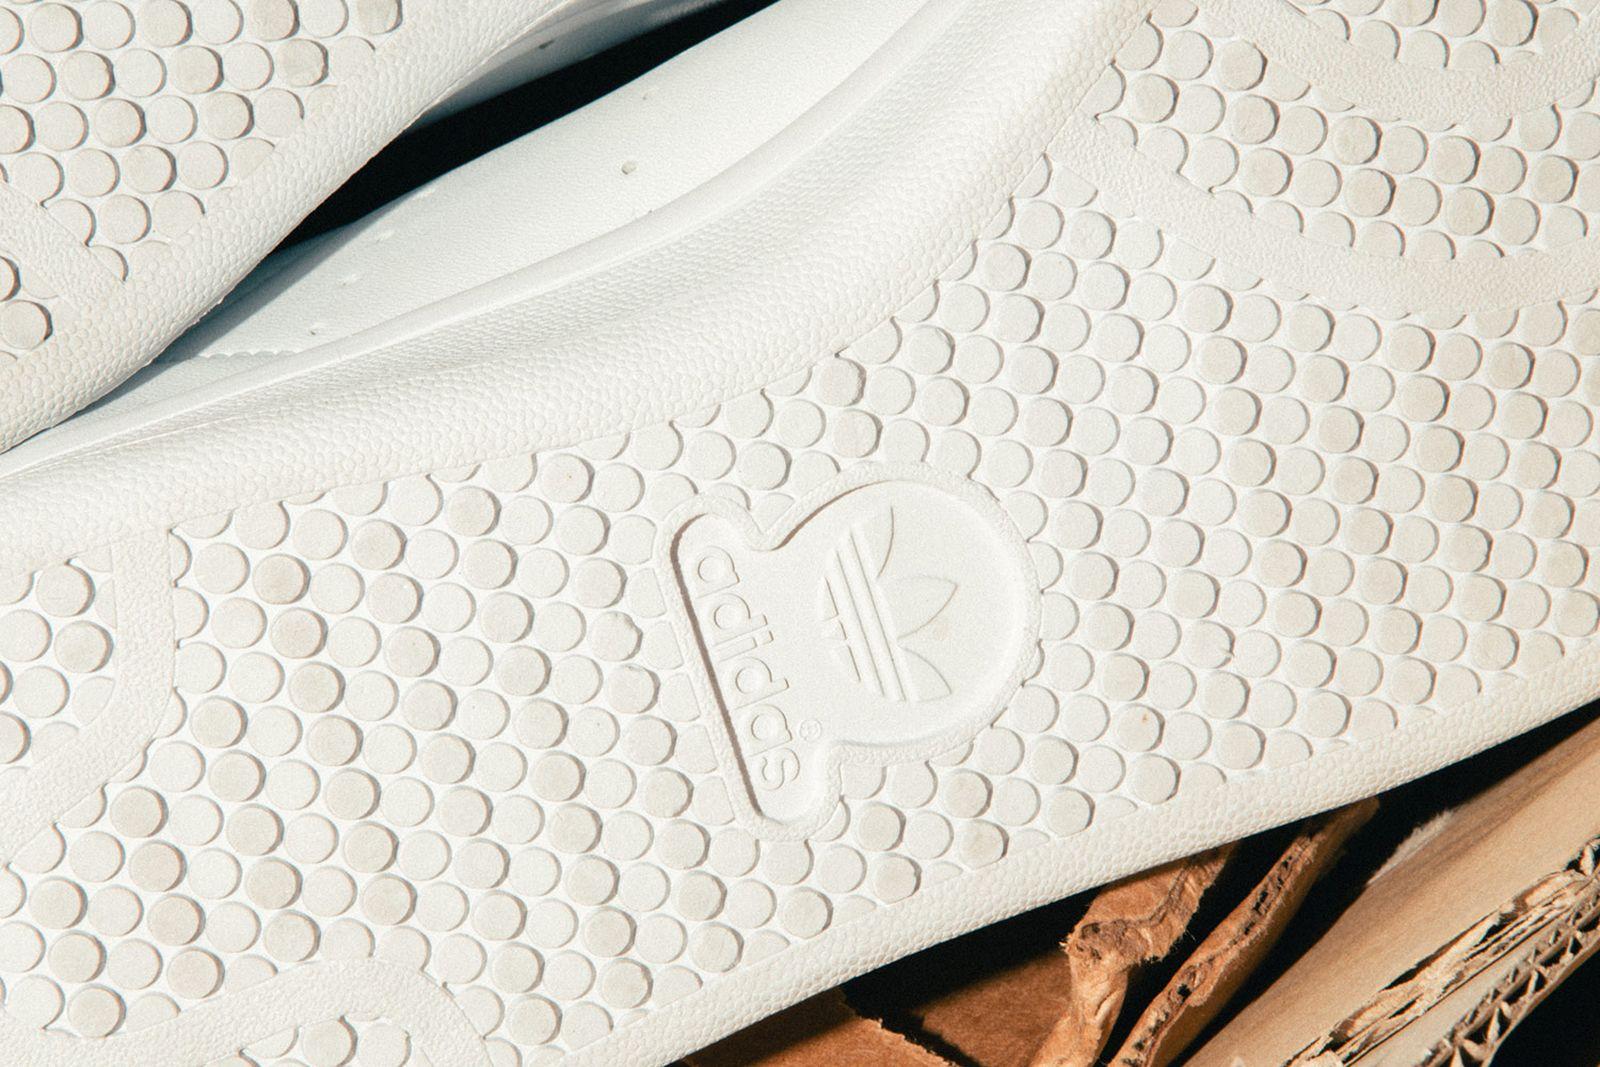 Legit-Check-Fake-Sneakers-Highsnobiety-11